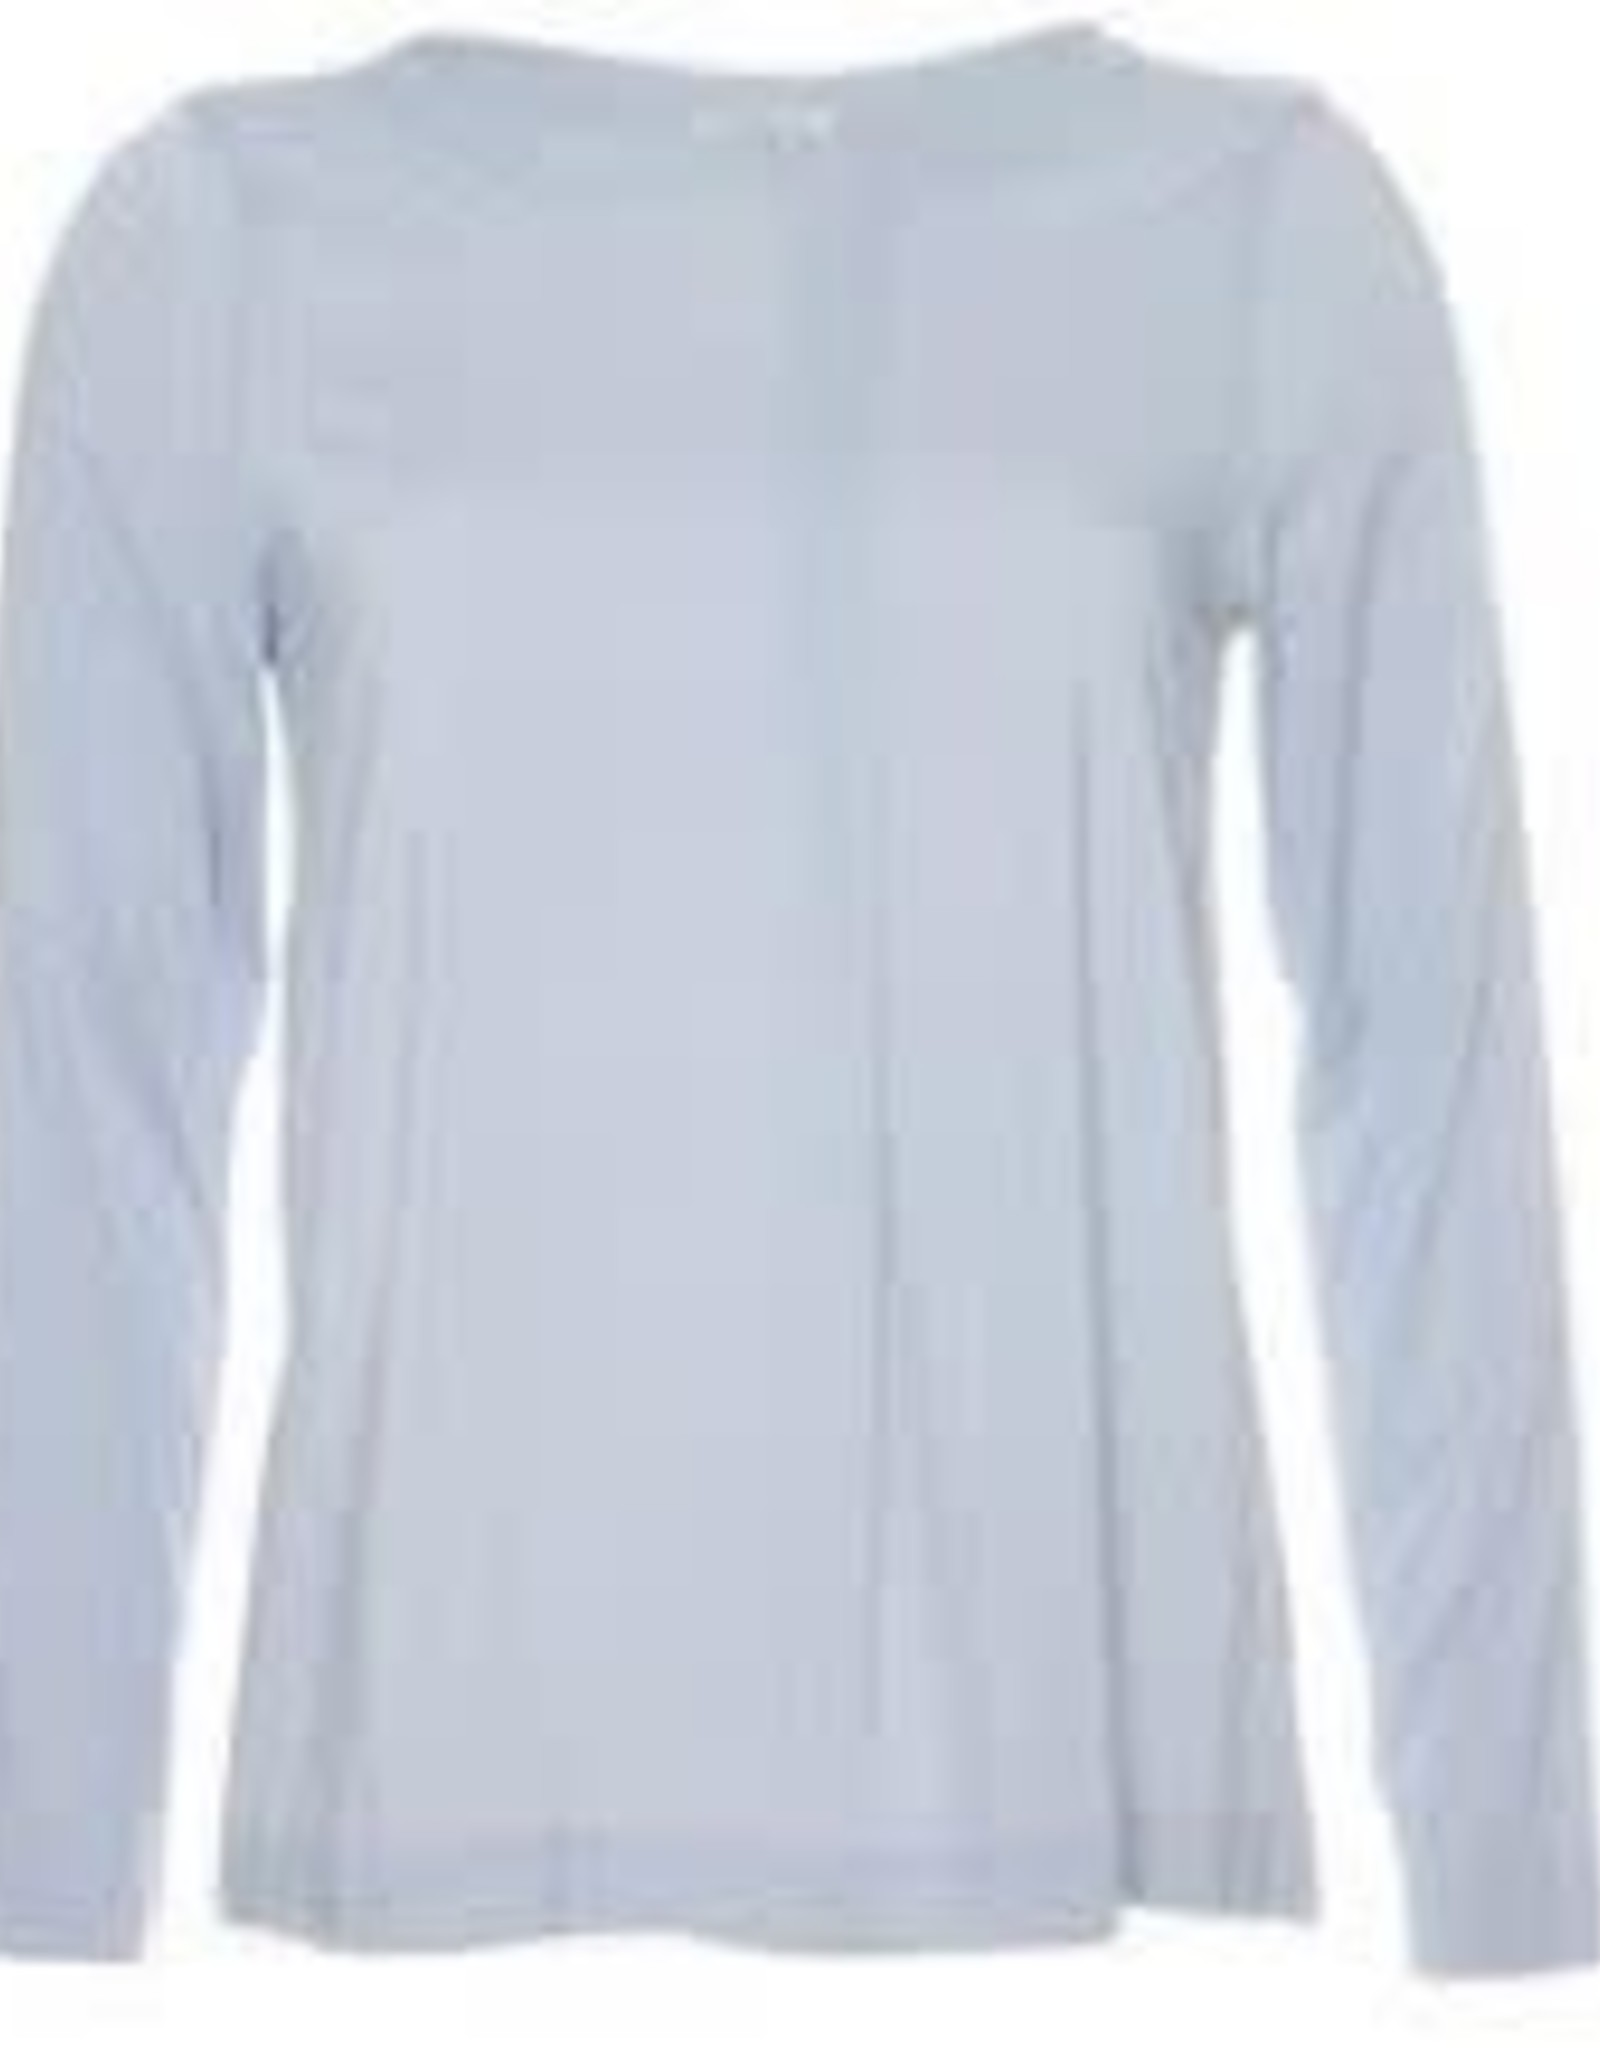 JcSophie Chardonnay blouse light blue C5042